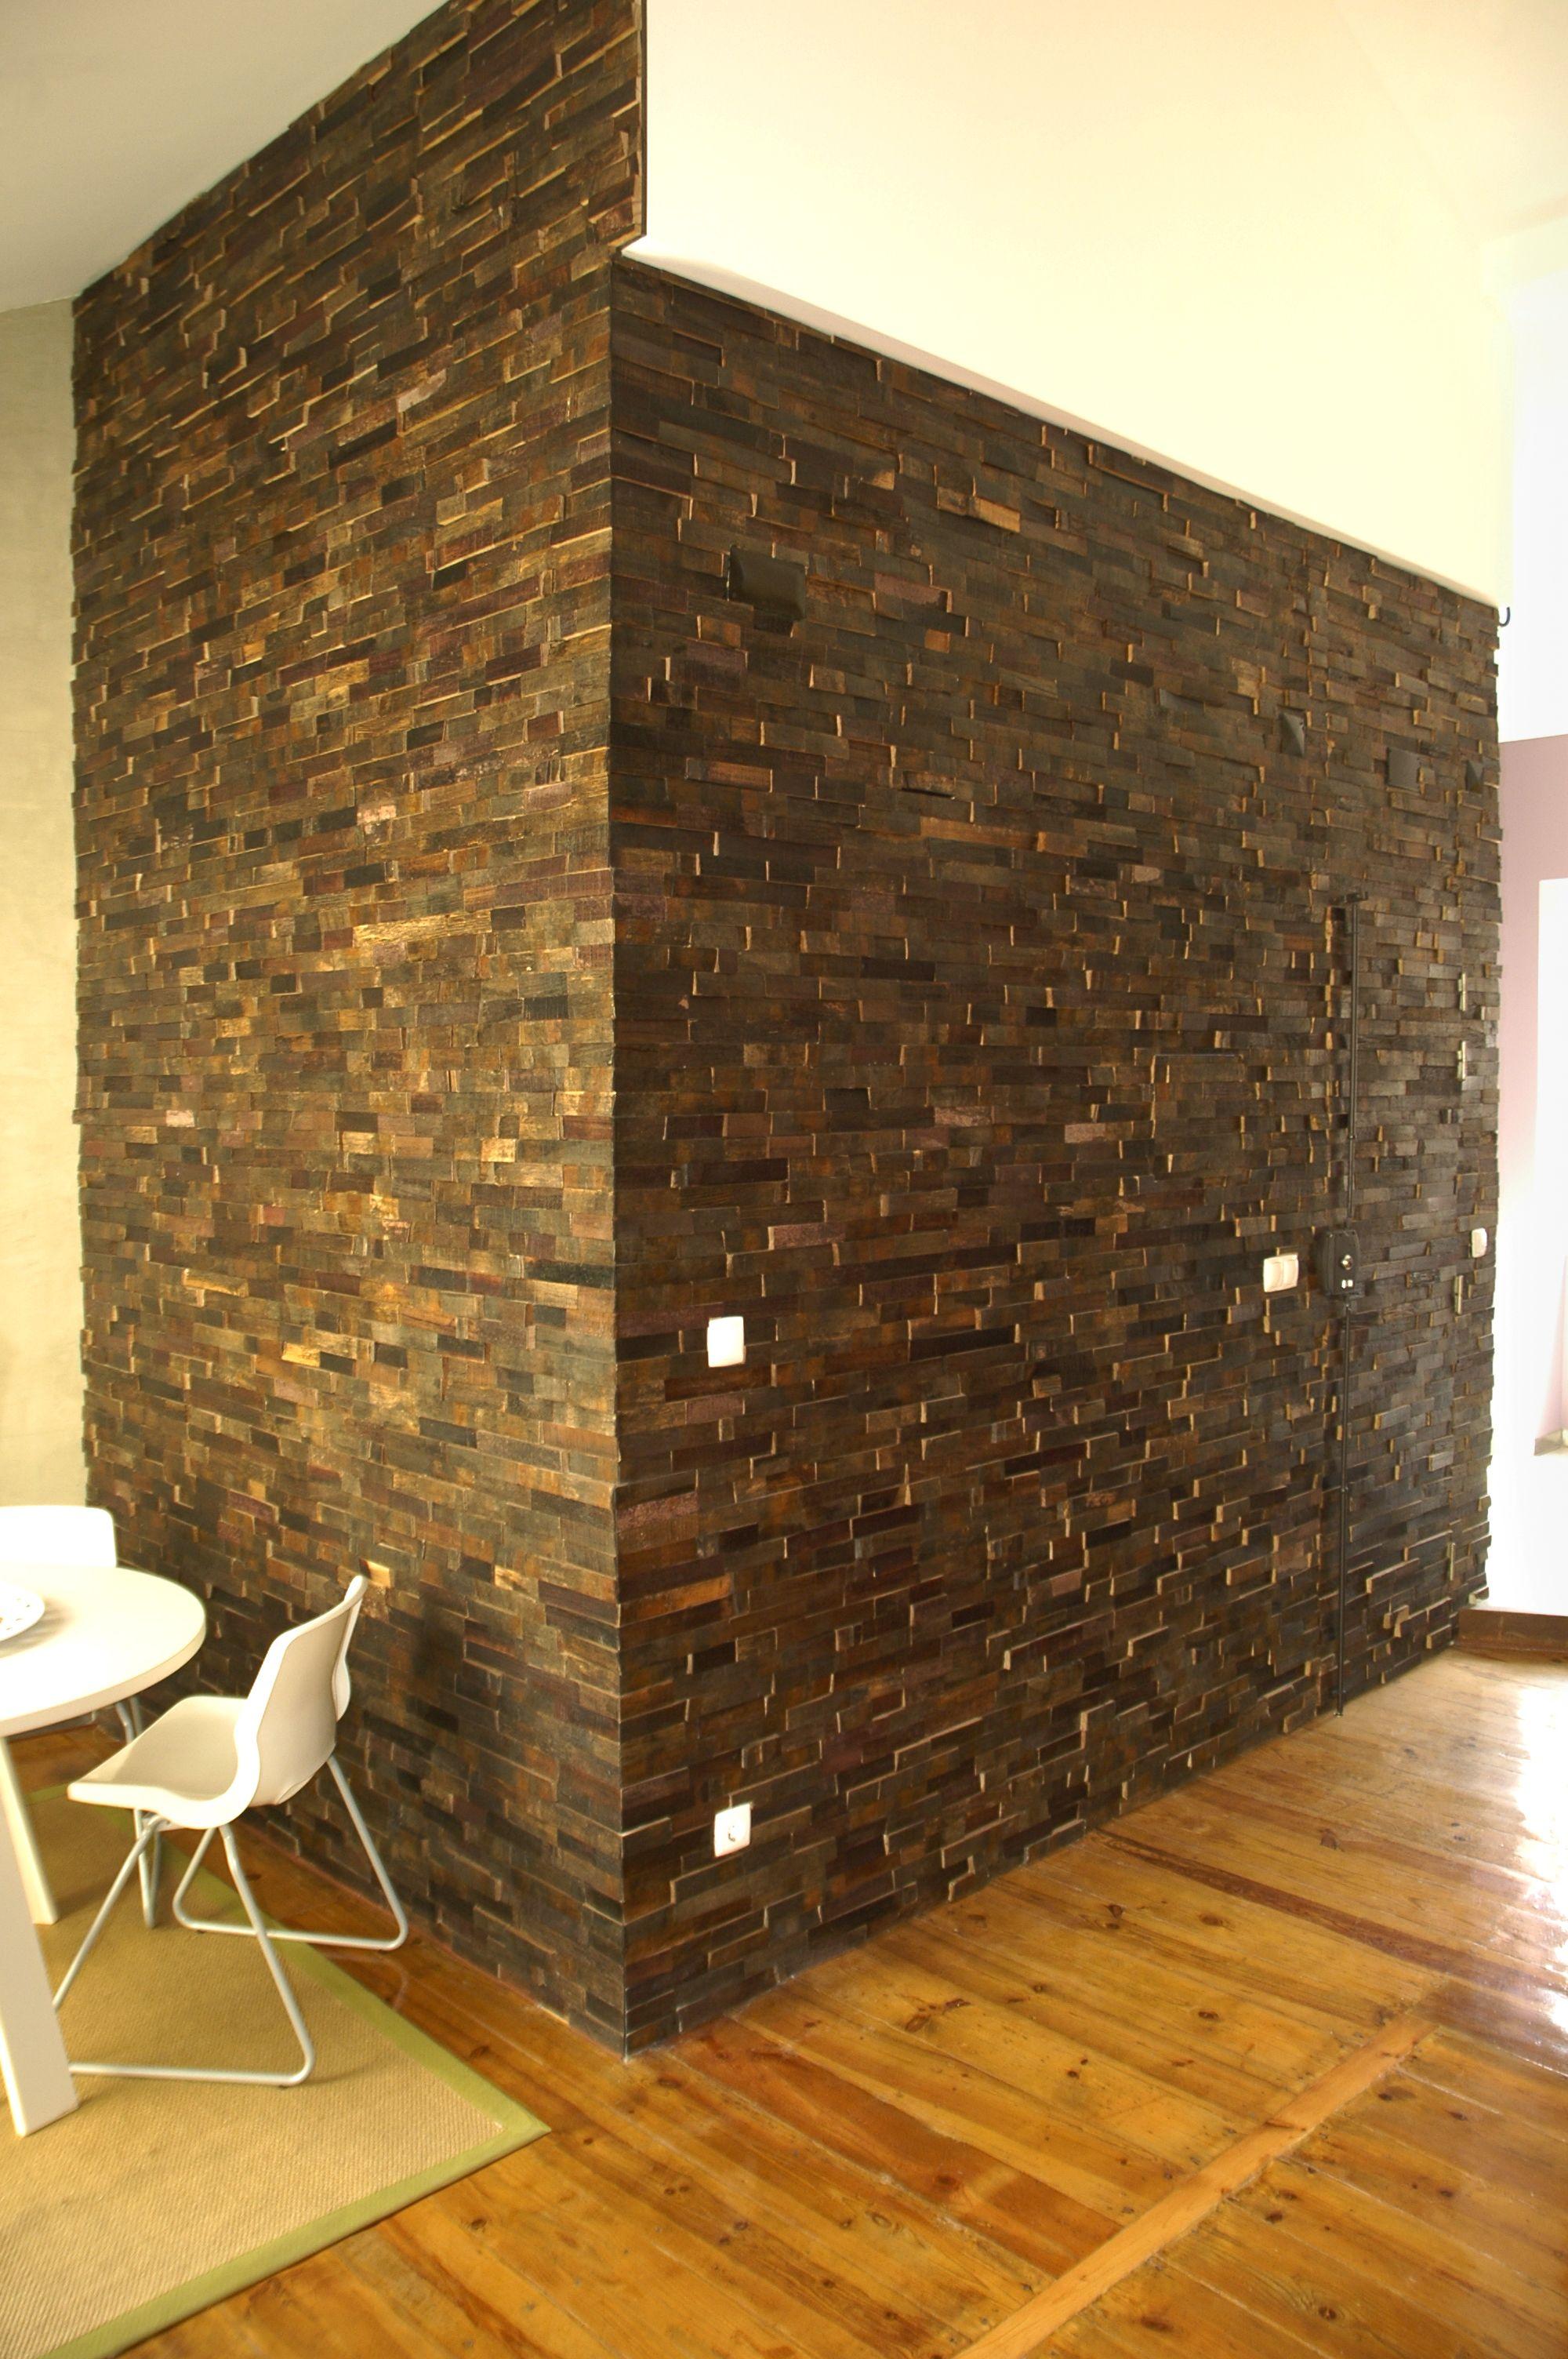 Brainwood – Pladec old barrels-pine, corner. #habitare2014 #design #sisustus #messut #helsinki #messukeskus